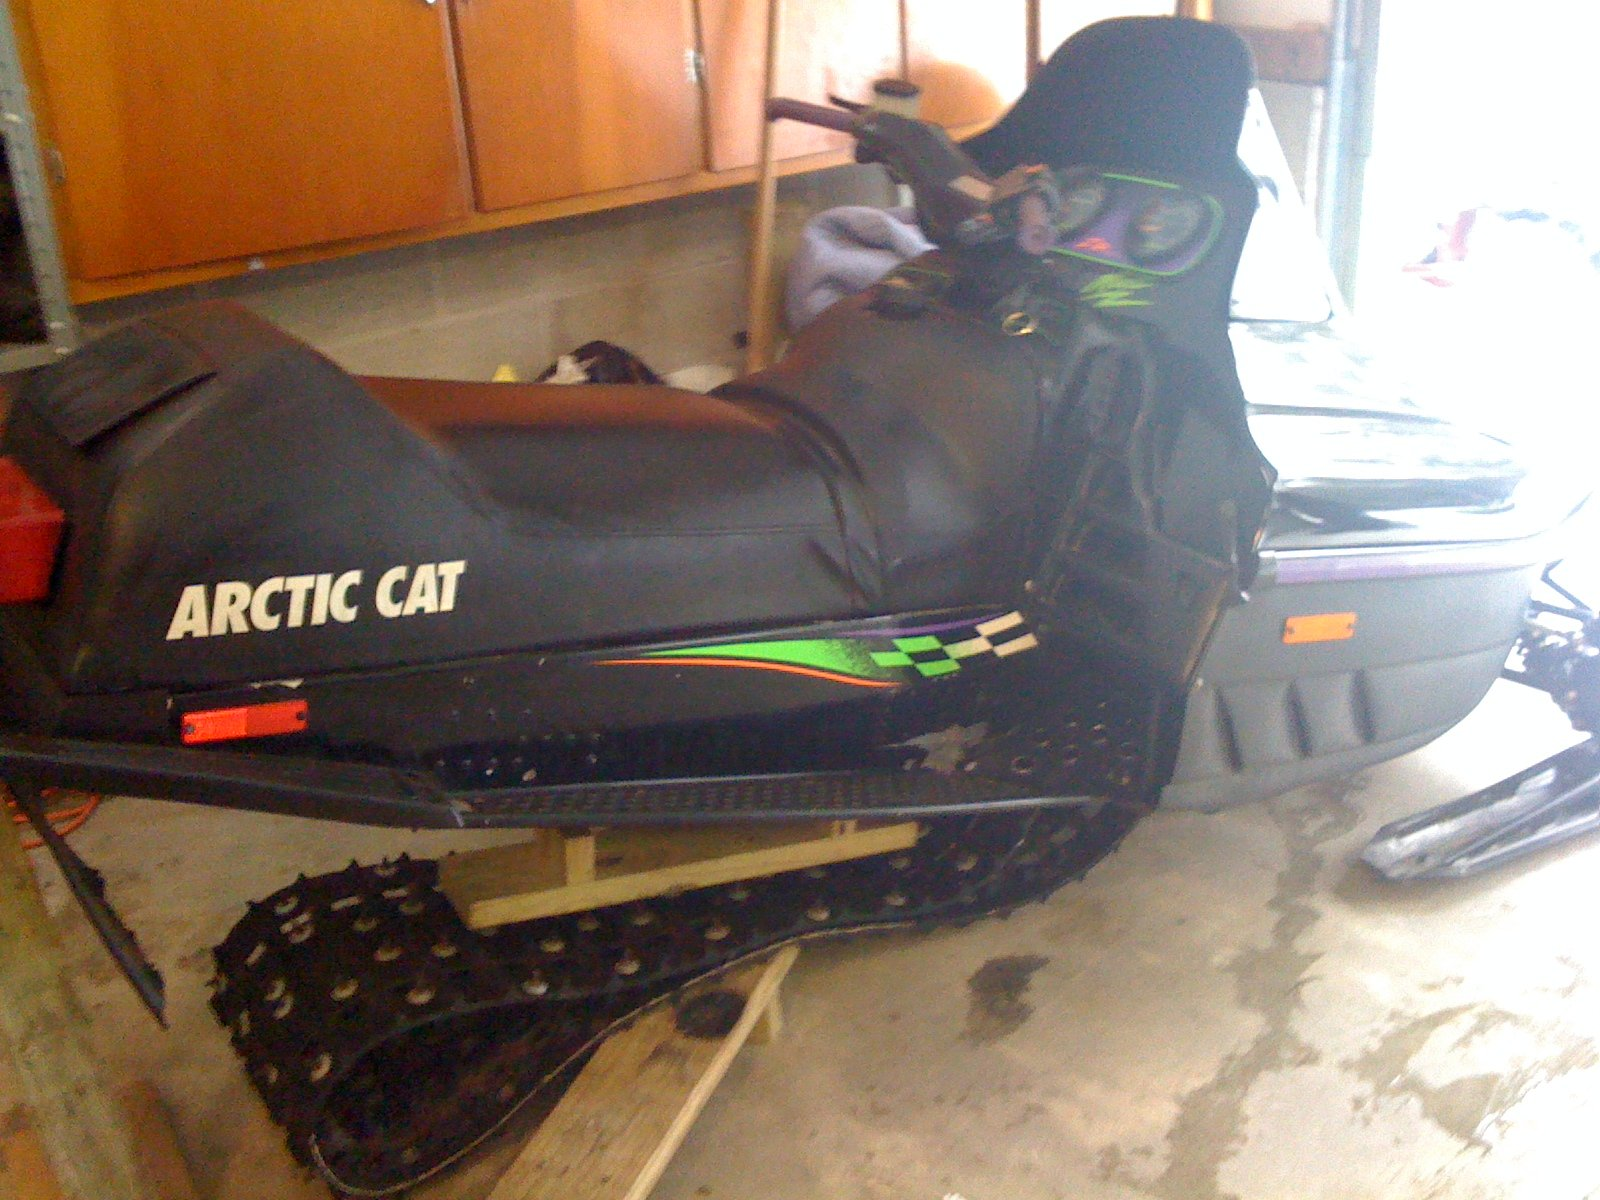 1995 Arctic Cat Cougar 550 Carburetor